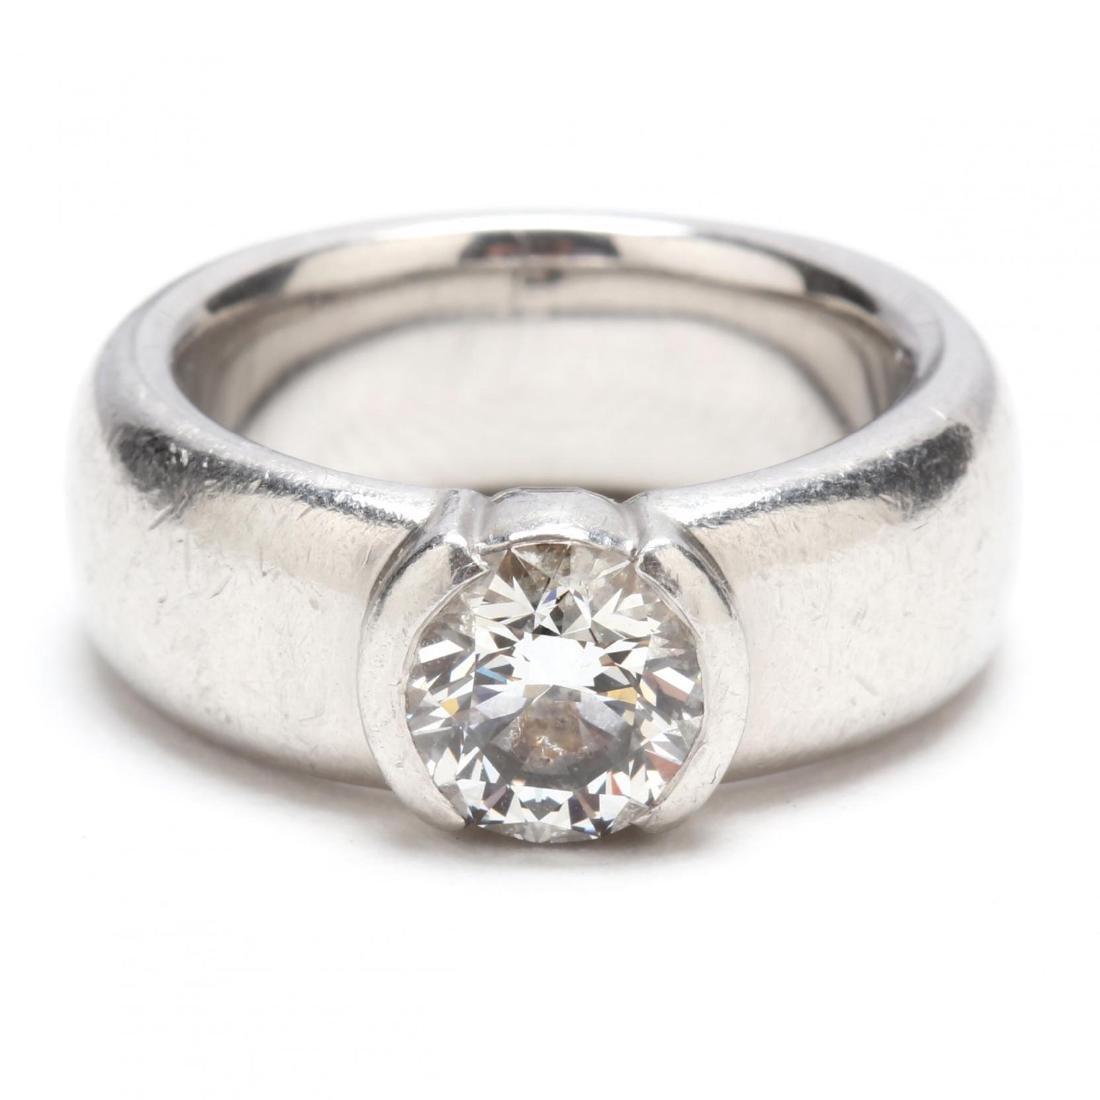 Platinum and Diamond Ring, Tiffany & Co.